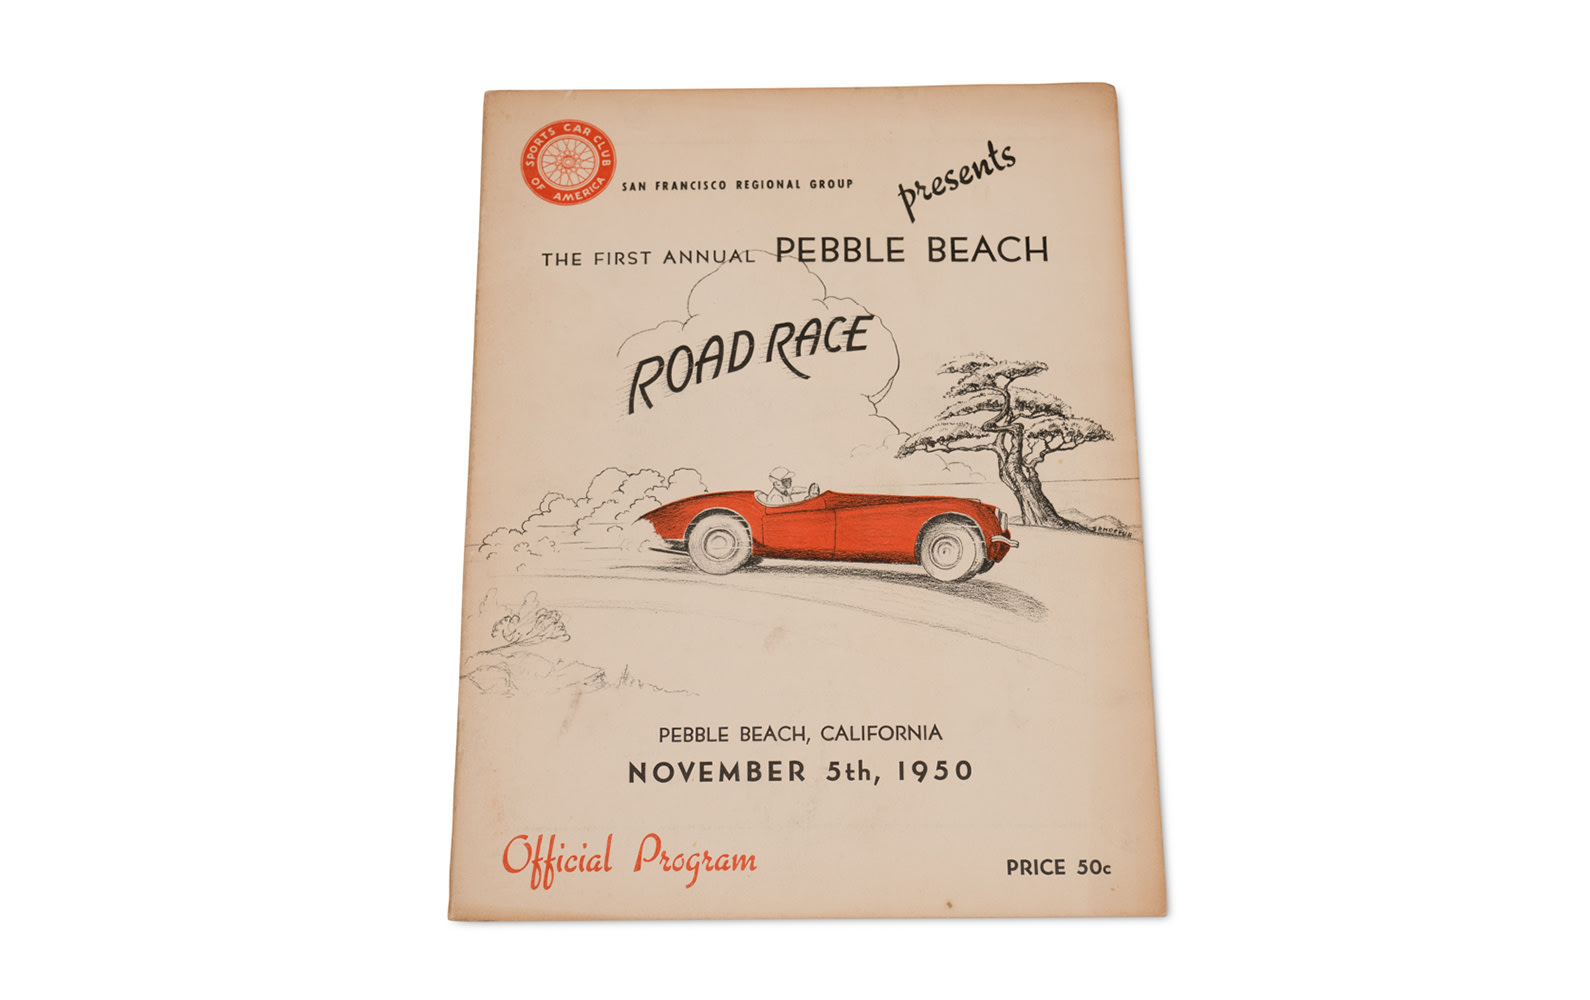 1950 Pebble Beach Road Race Official Program